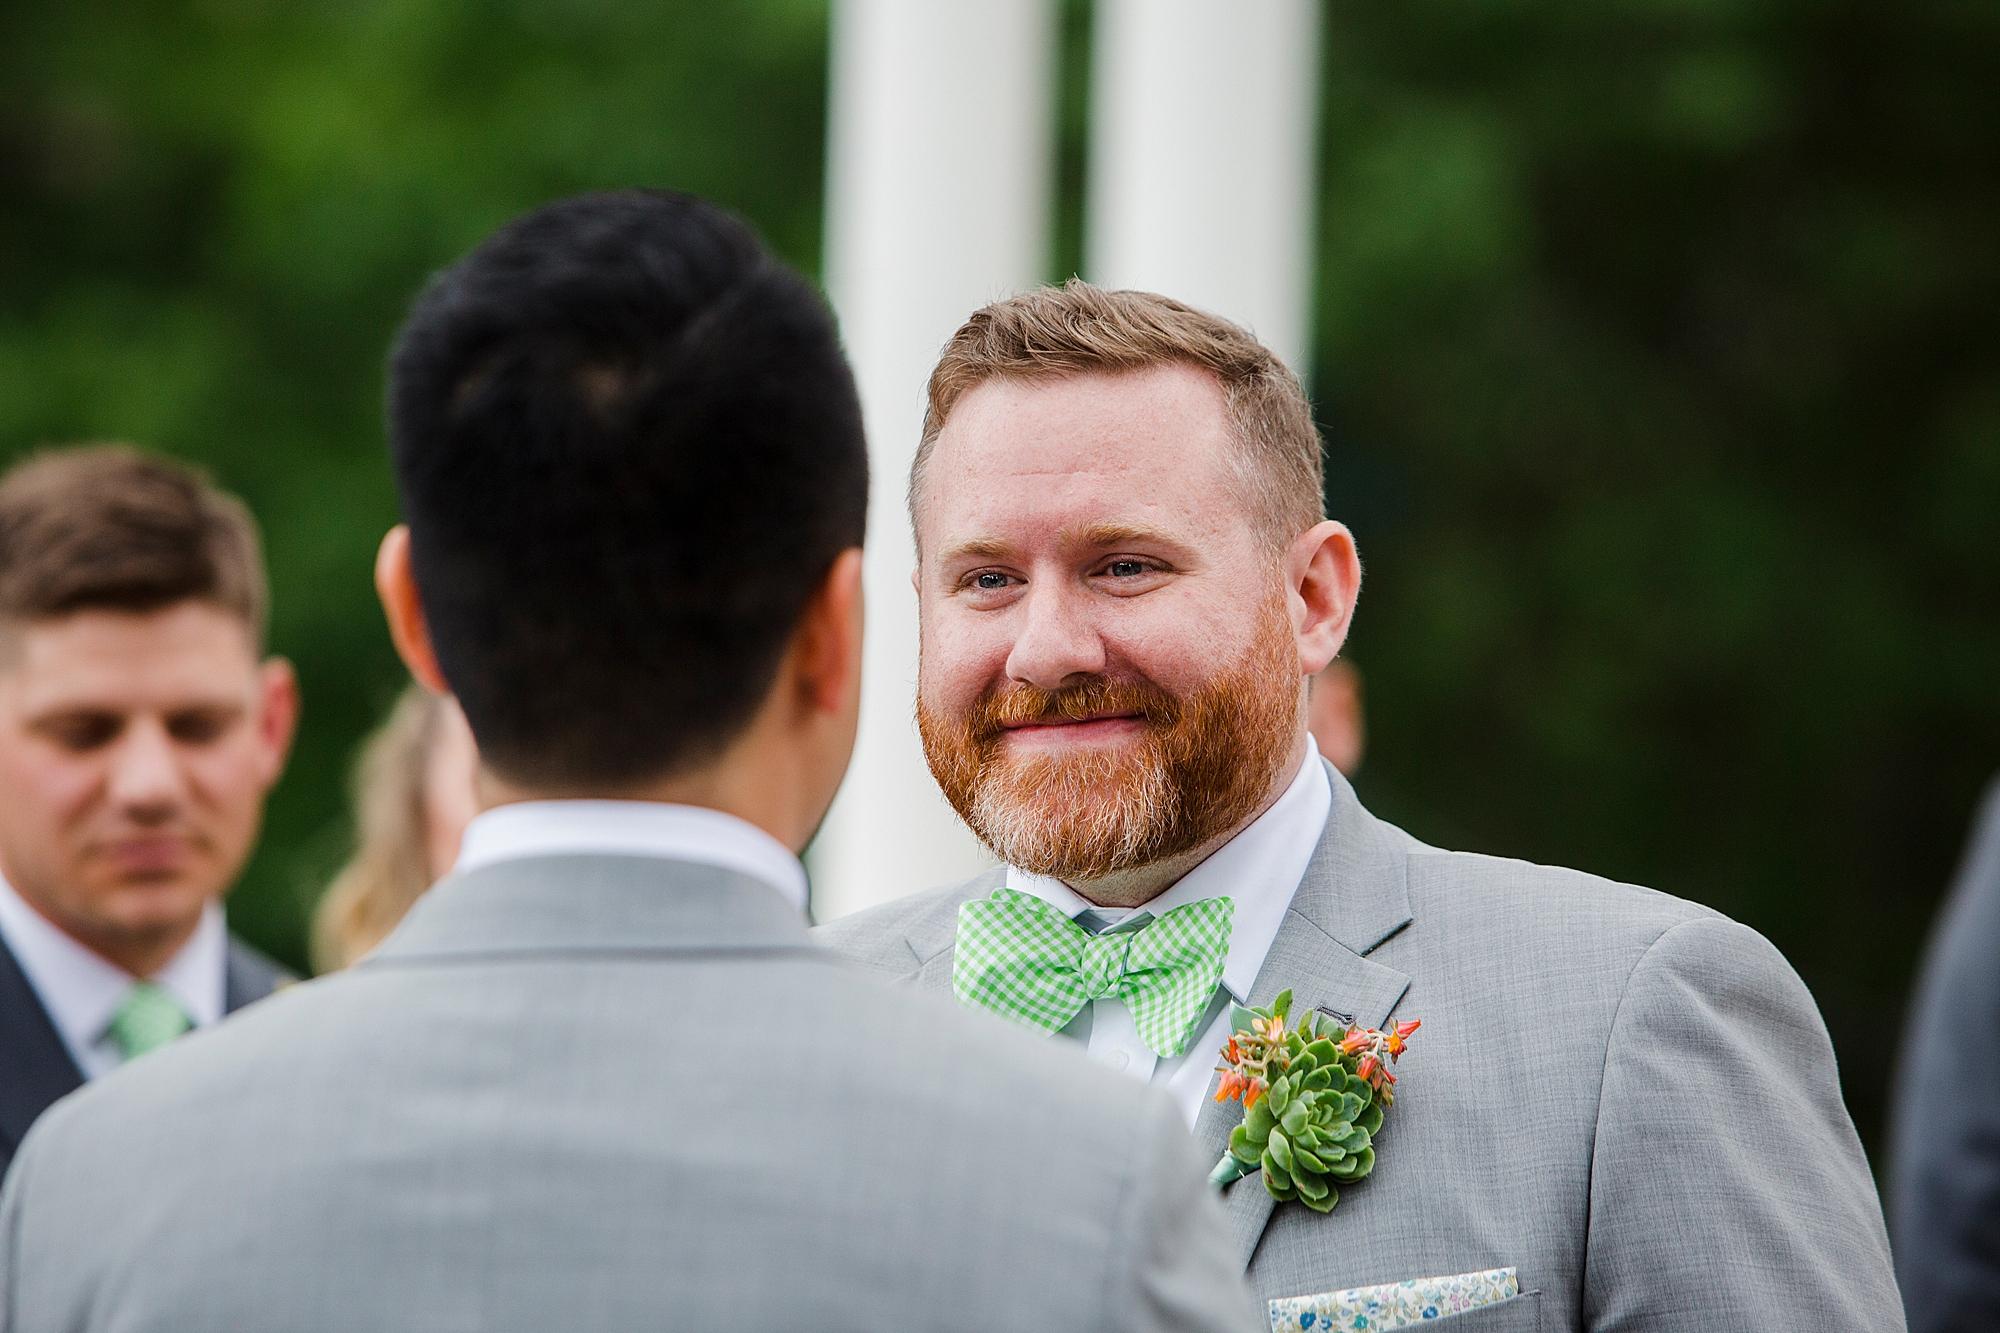 Dan_and_Byron_Love_by_Joe_Mac_Philadelphia_Wedding_LGBTQ_Photography_Gay_Independence_visitor_Center_87.JPG